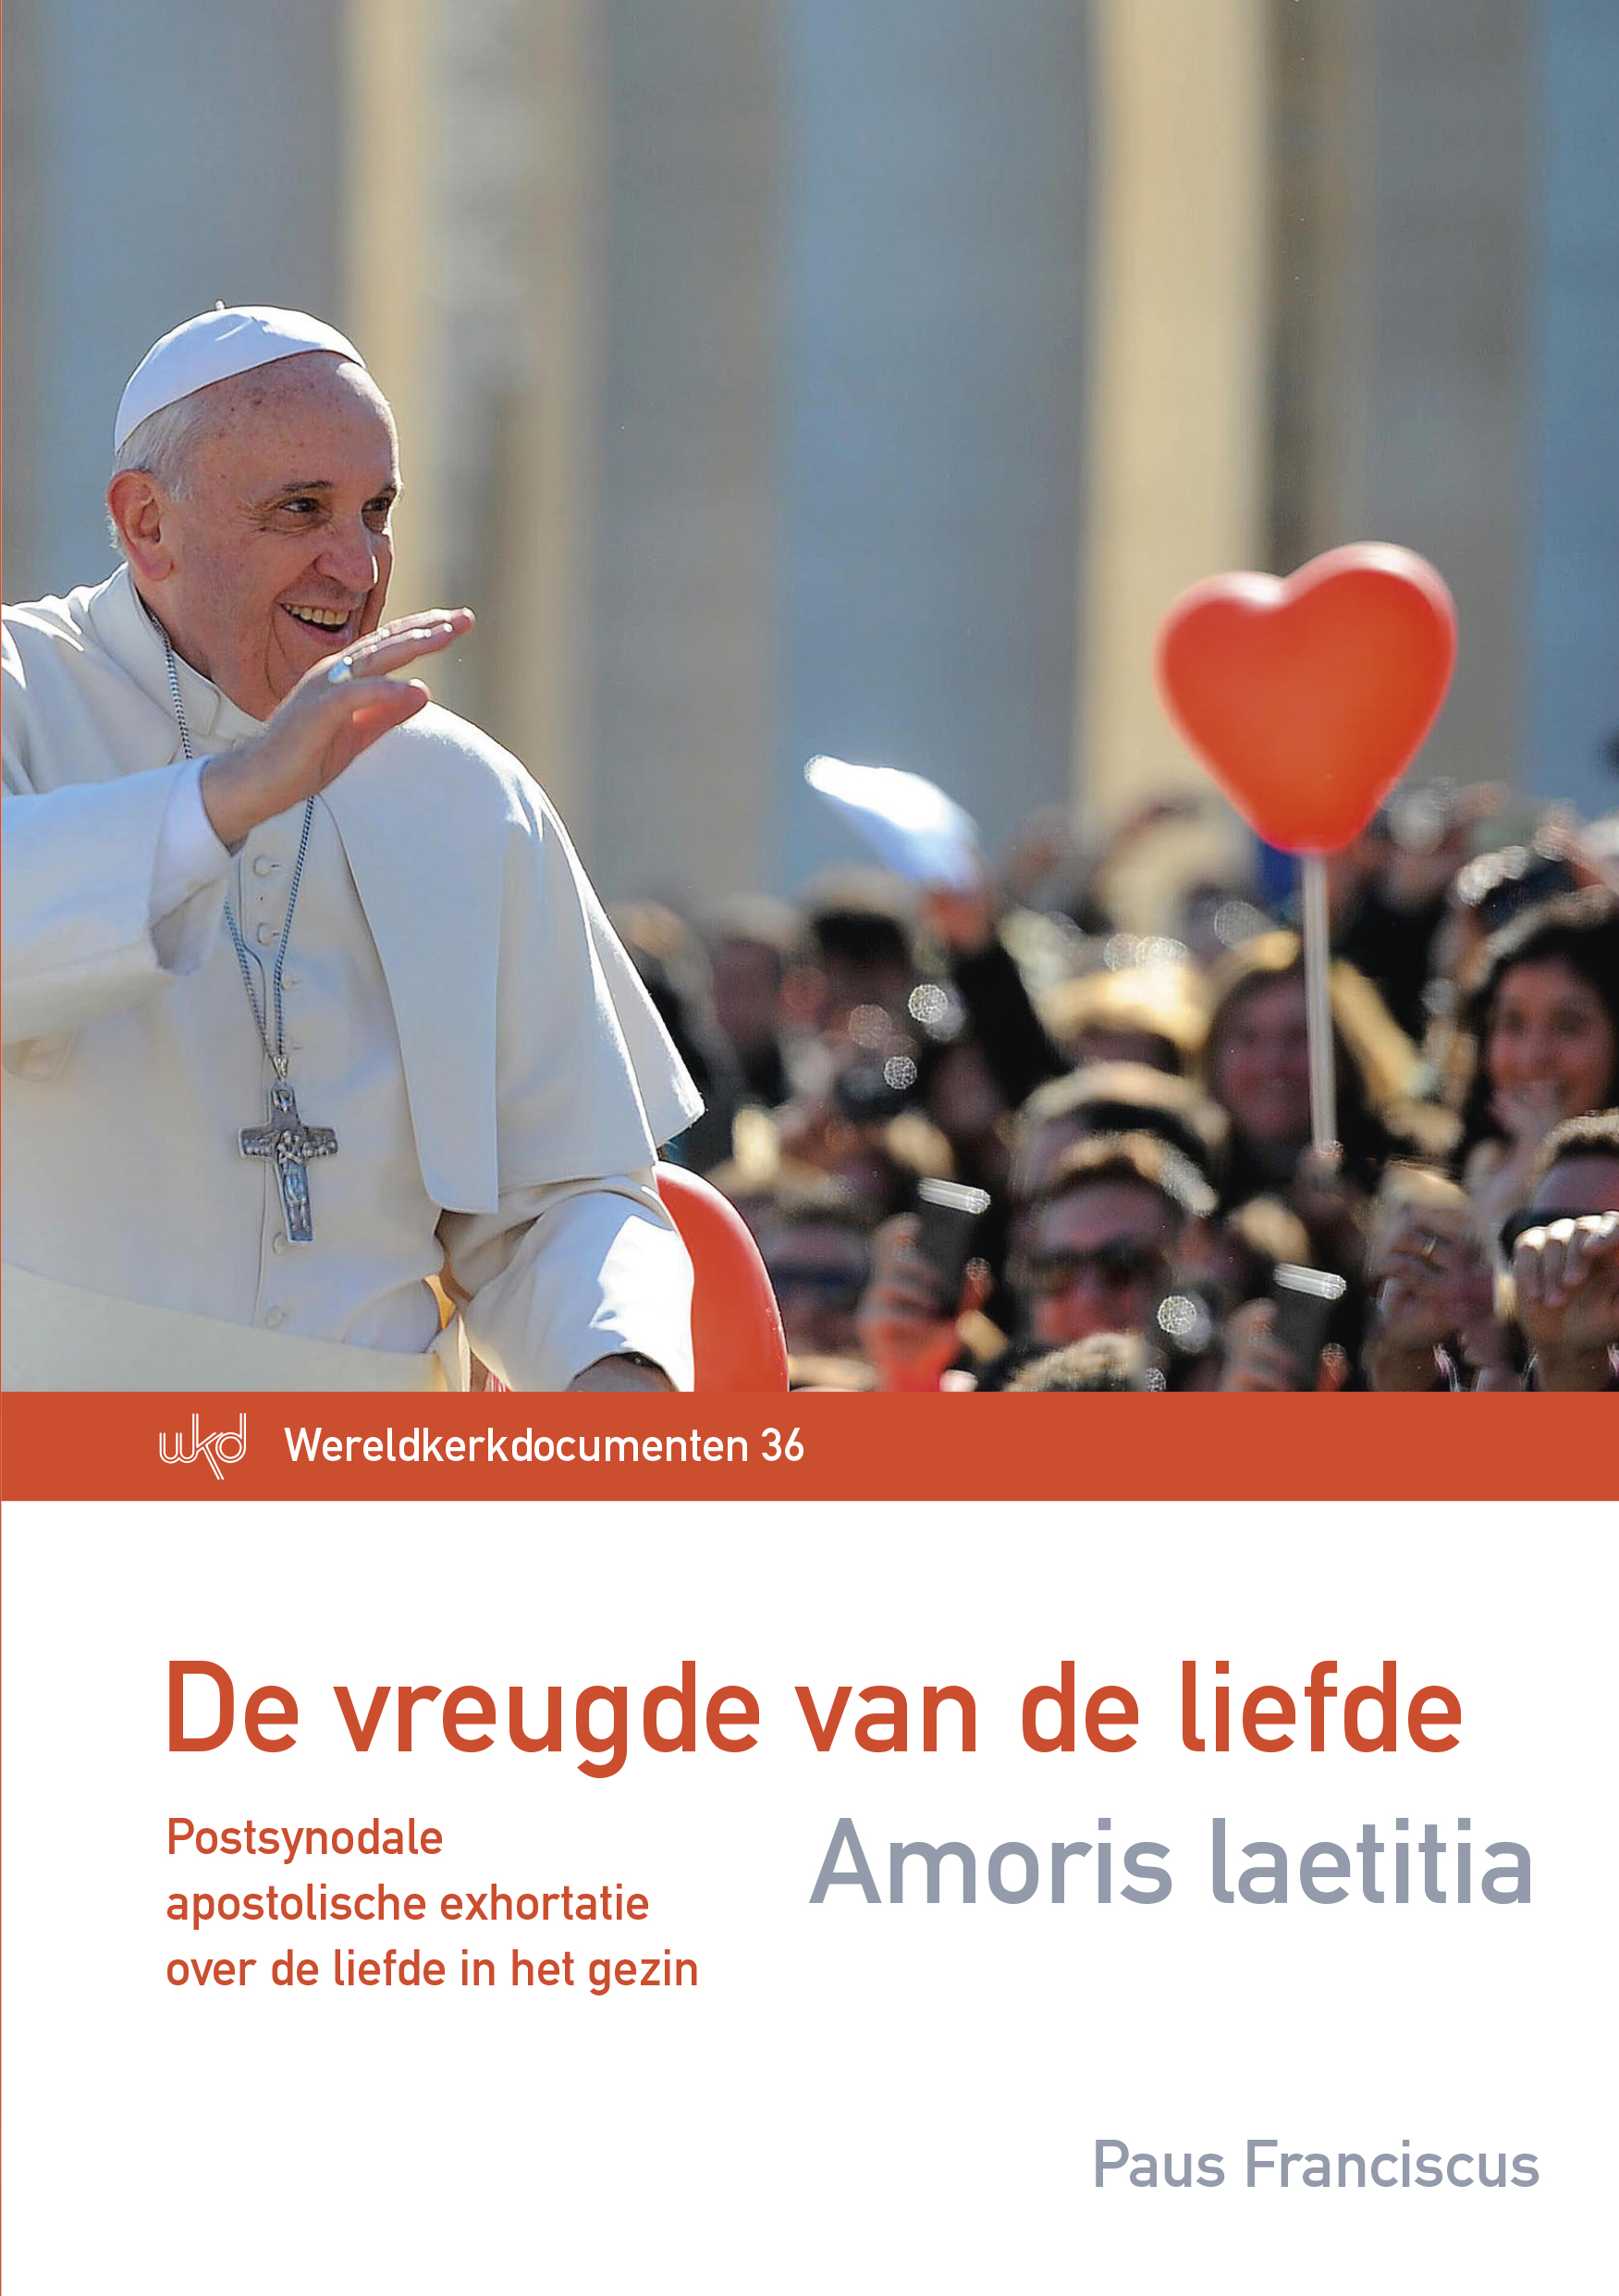 Amoris Laetitia De Vreugde Van De Liefde Gezinspastoraal